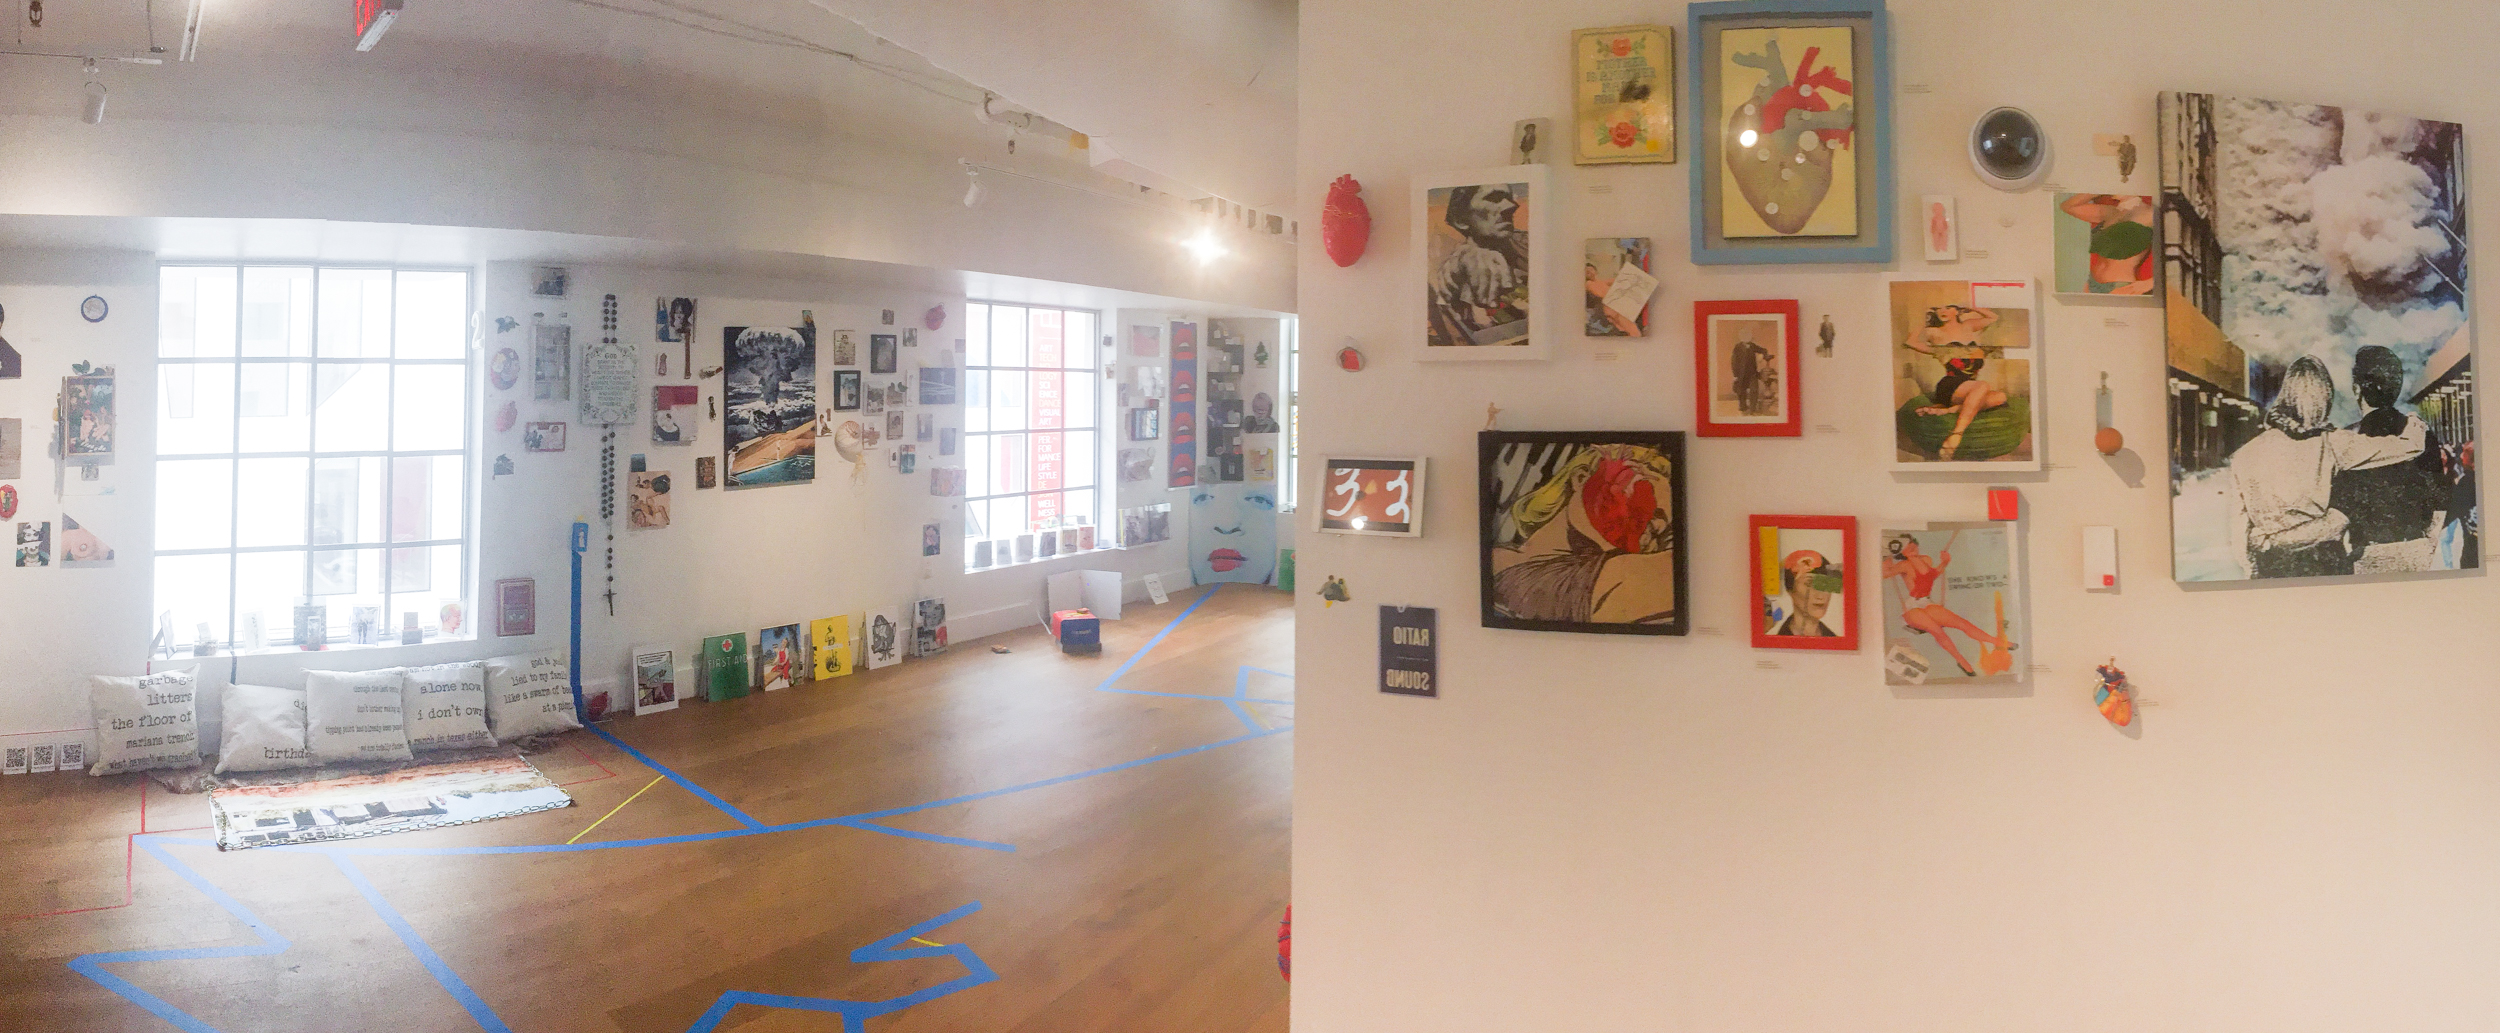 Faena-Exhibition-Images-4.jpg